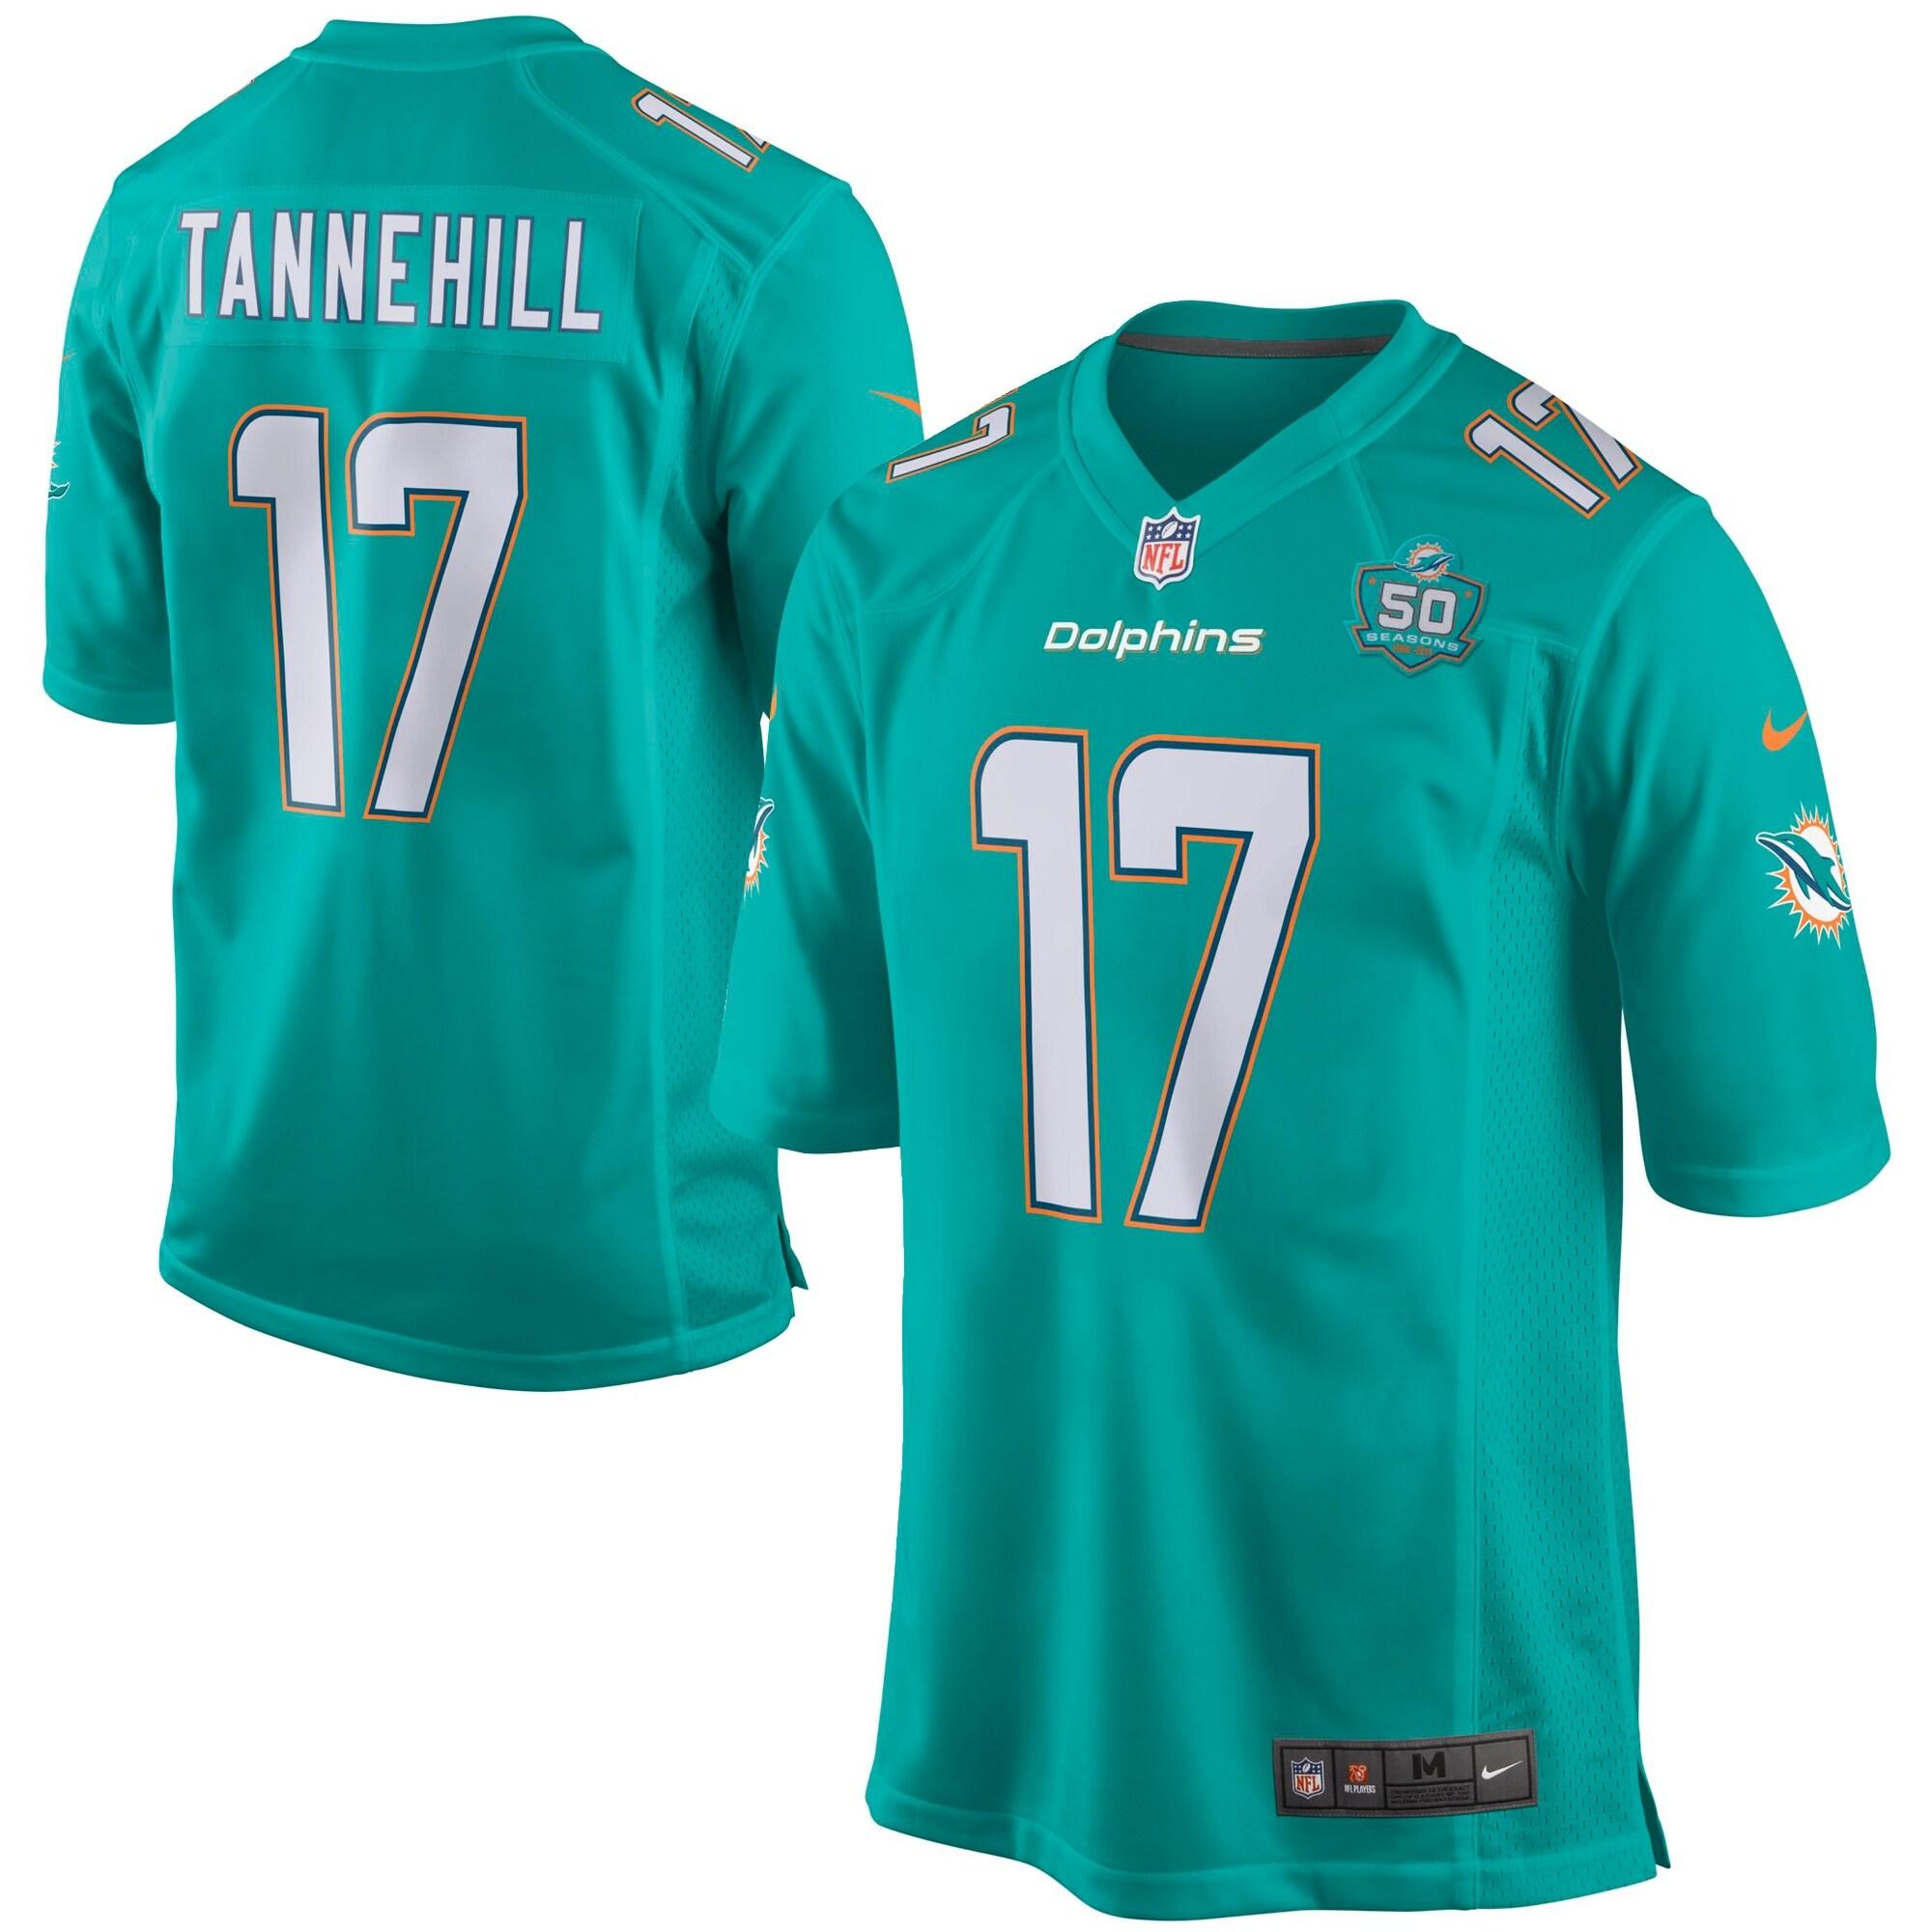 Ryan Tannehill Miami Dolphins Nike Team Game 2015 NFL Patch Jersey - Aqua